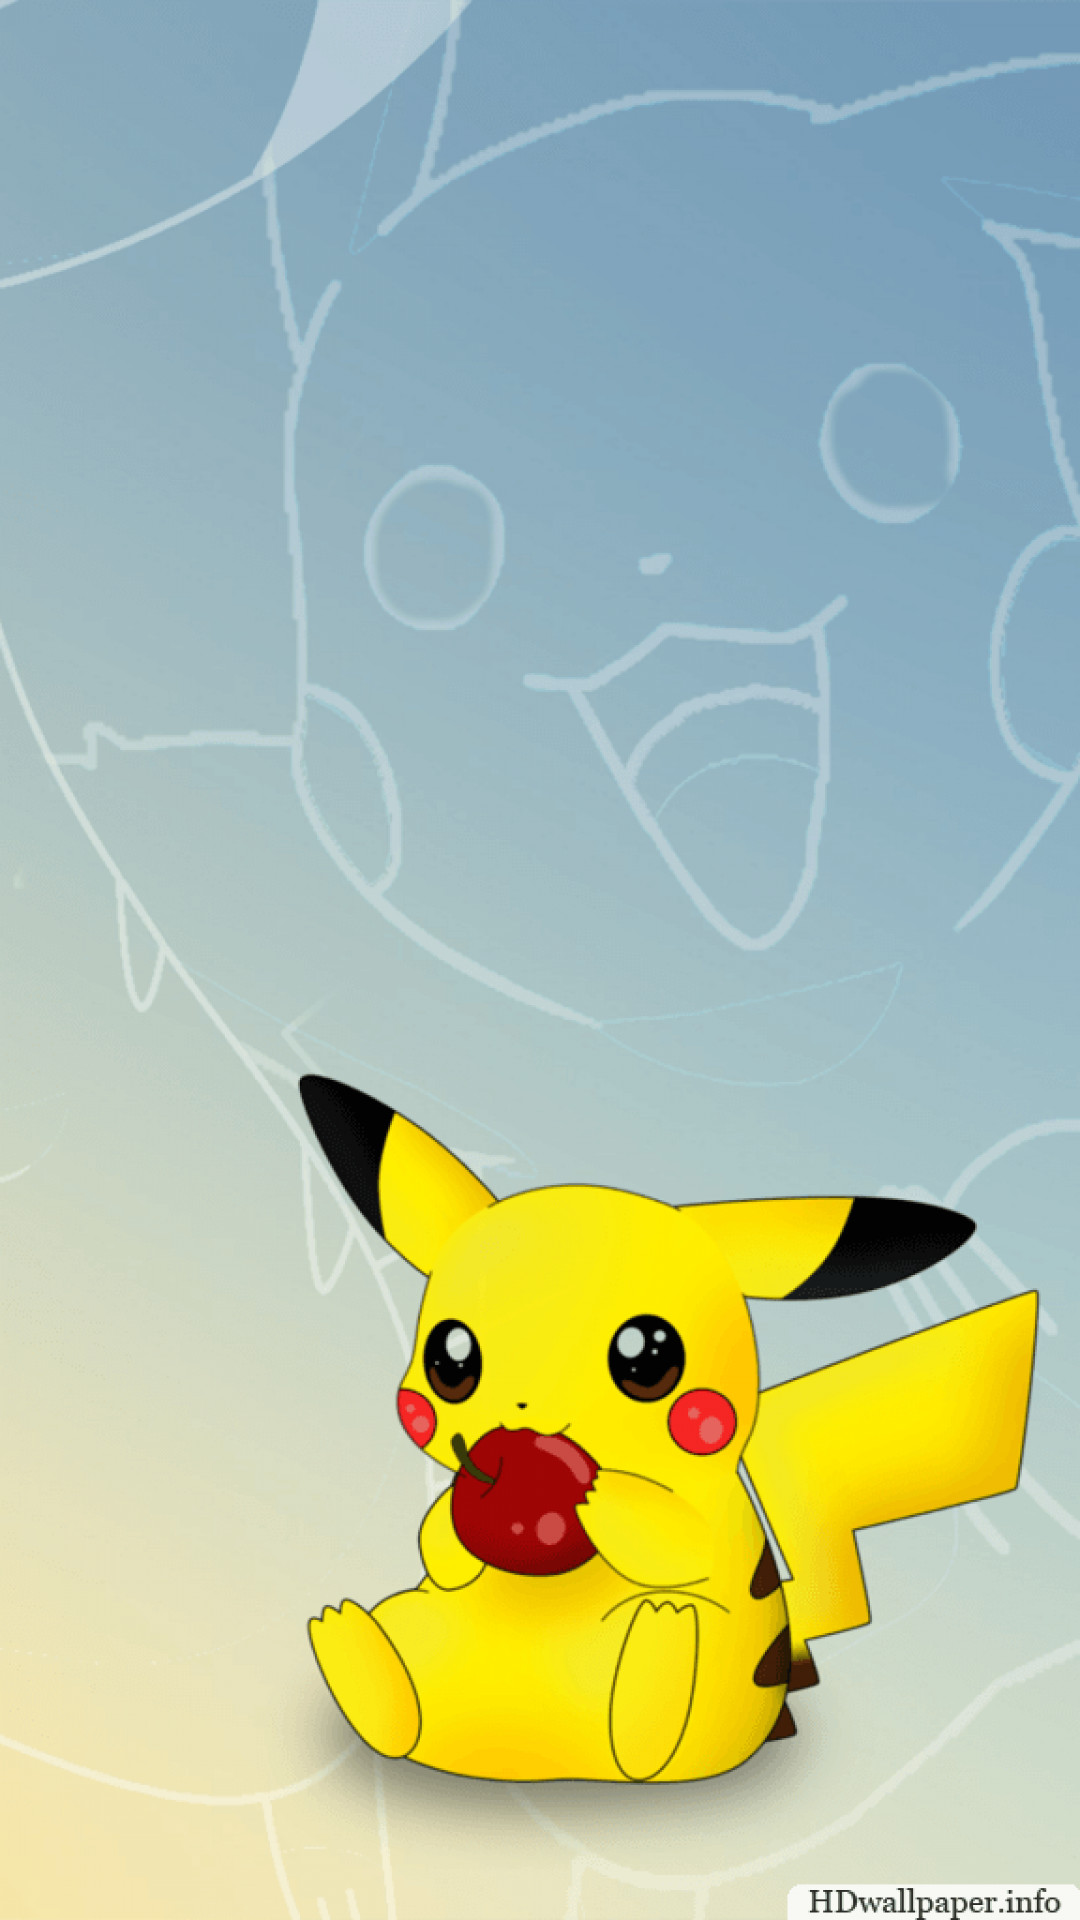 pikachu wallpaper iphone 6 plus